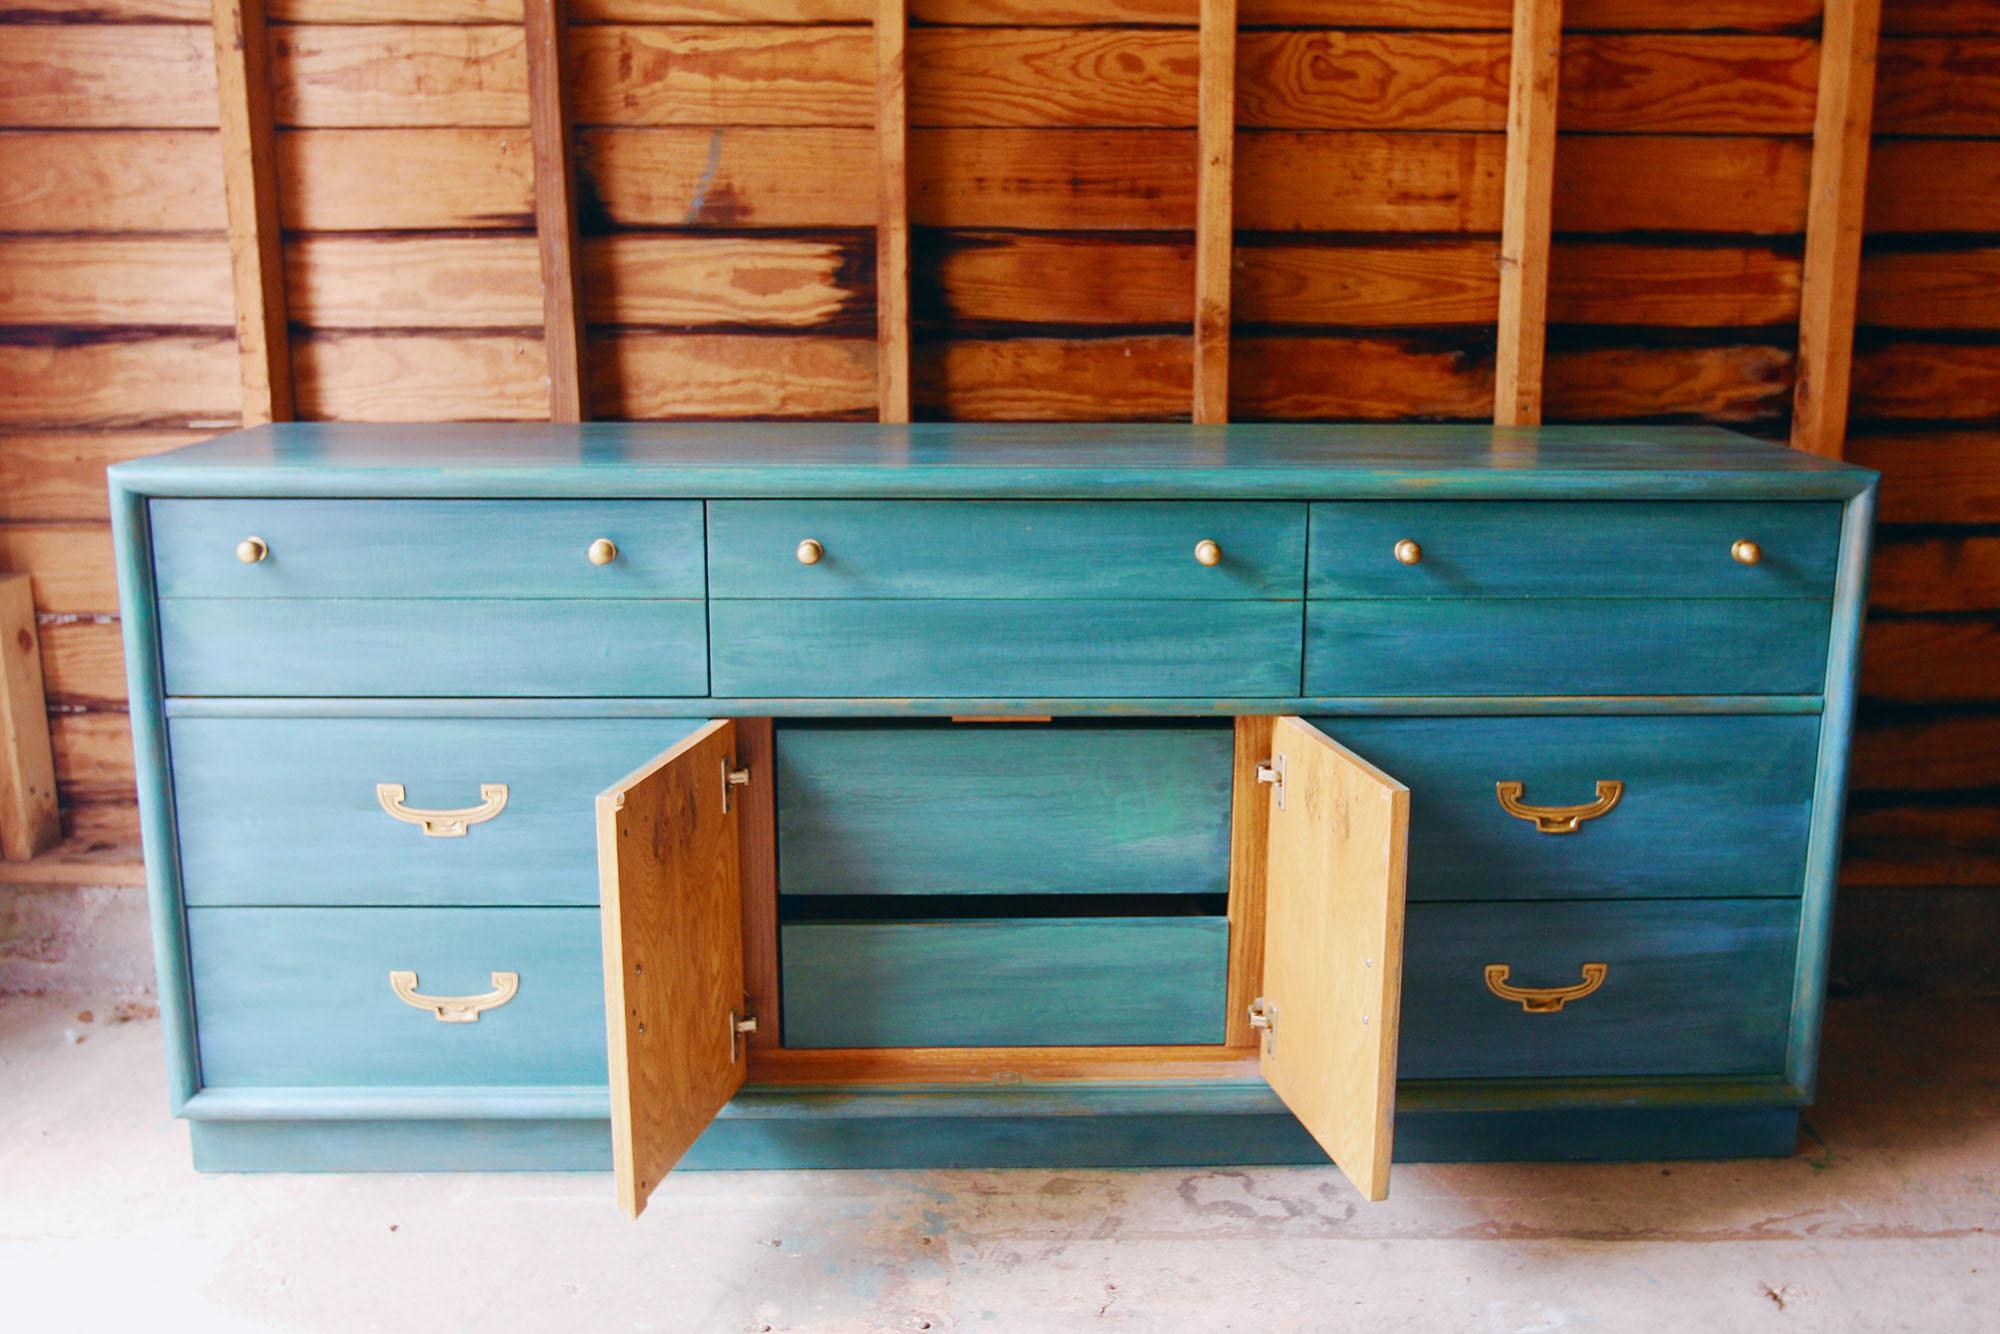 a-simpler-design-annie-sloan-turquoise-teal-water-technique-jpg3.jpg